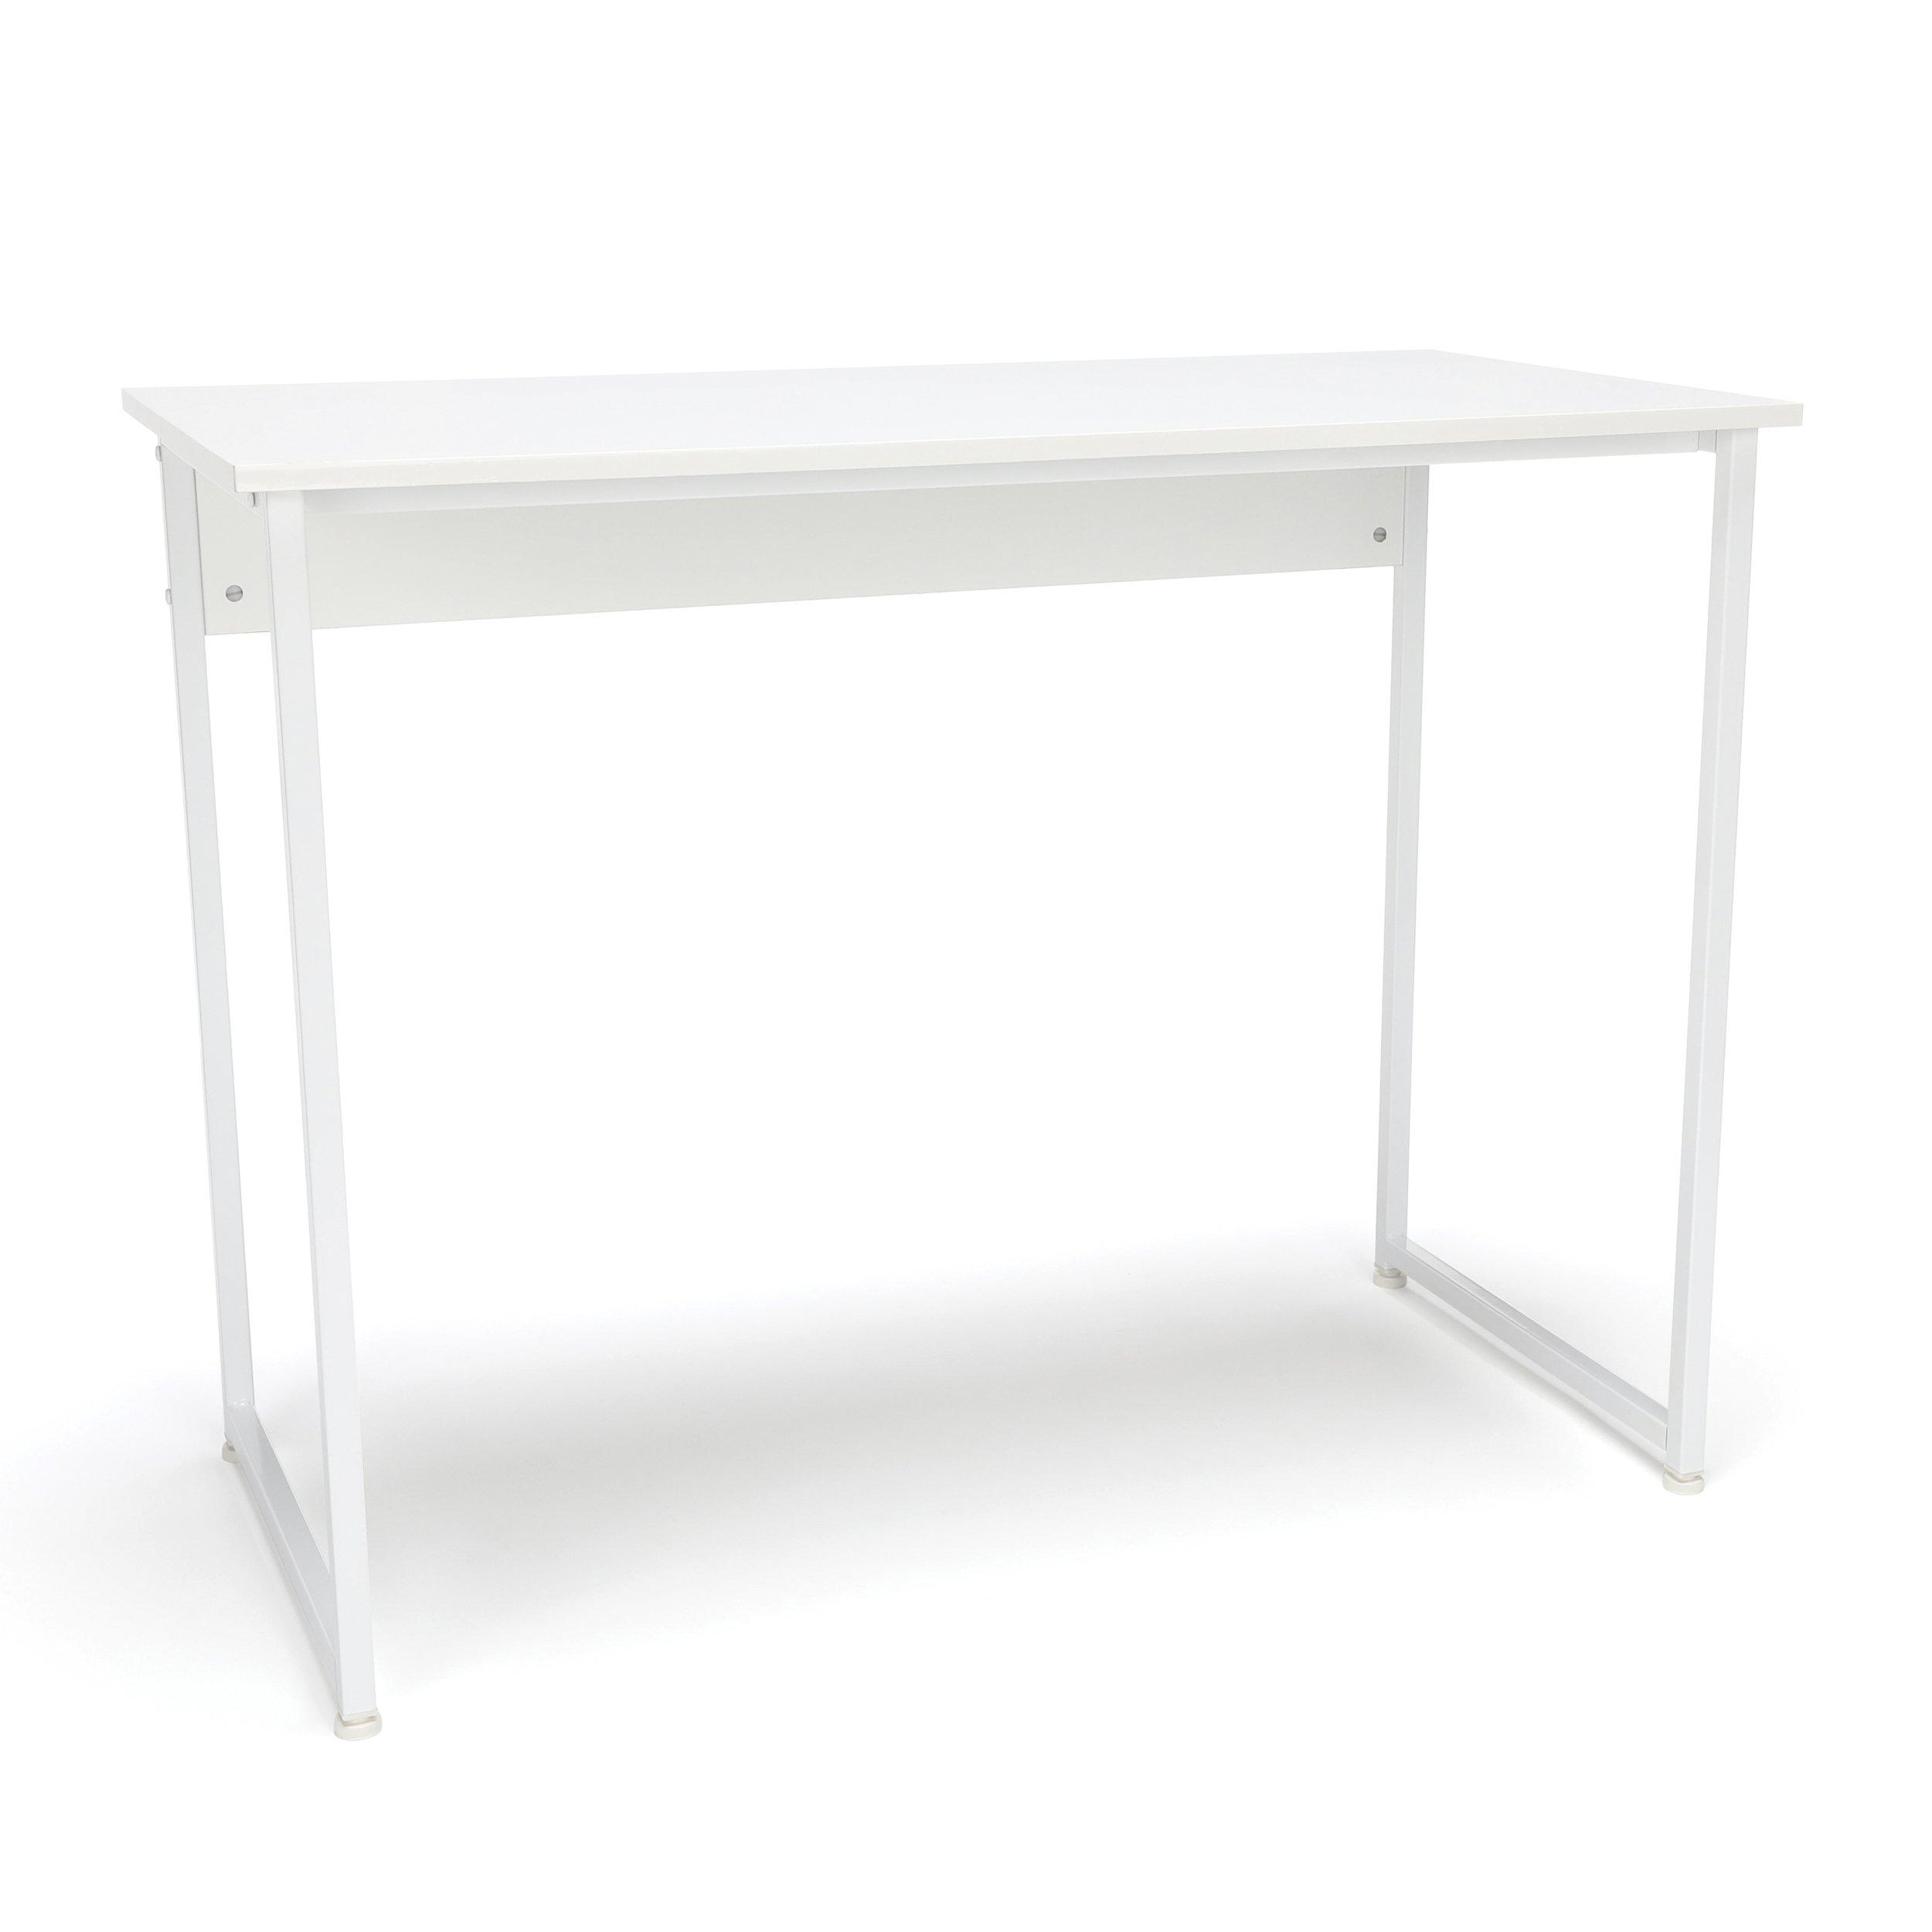 Essentials Office Desk with Metal Legs - Modern Computer Desk and Workstation, White (ESS-1040-WHT-WHT)